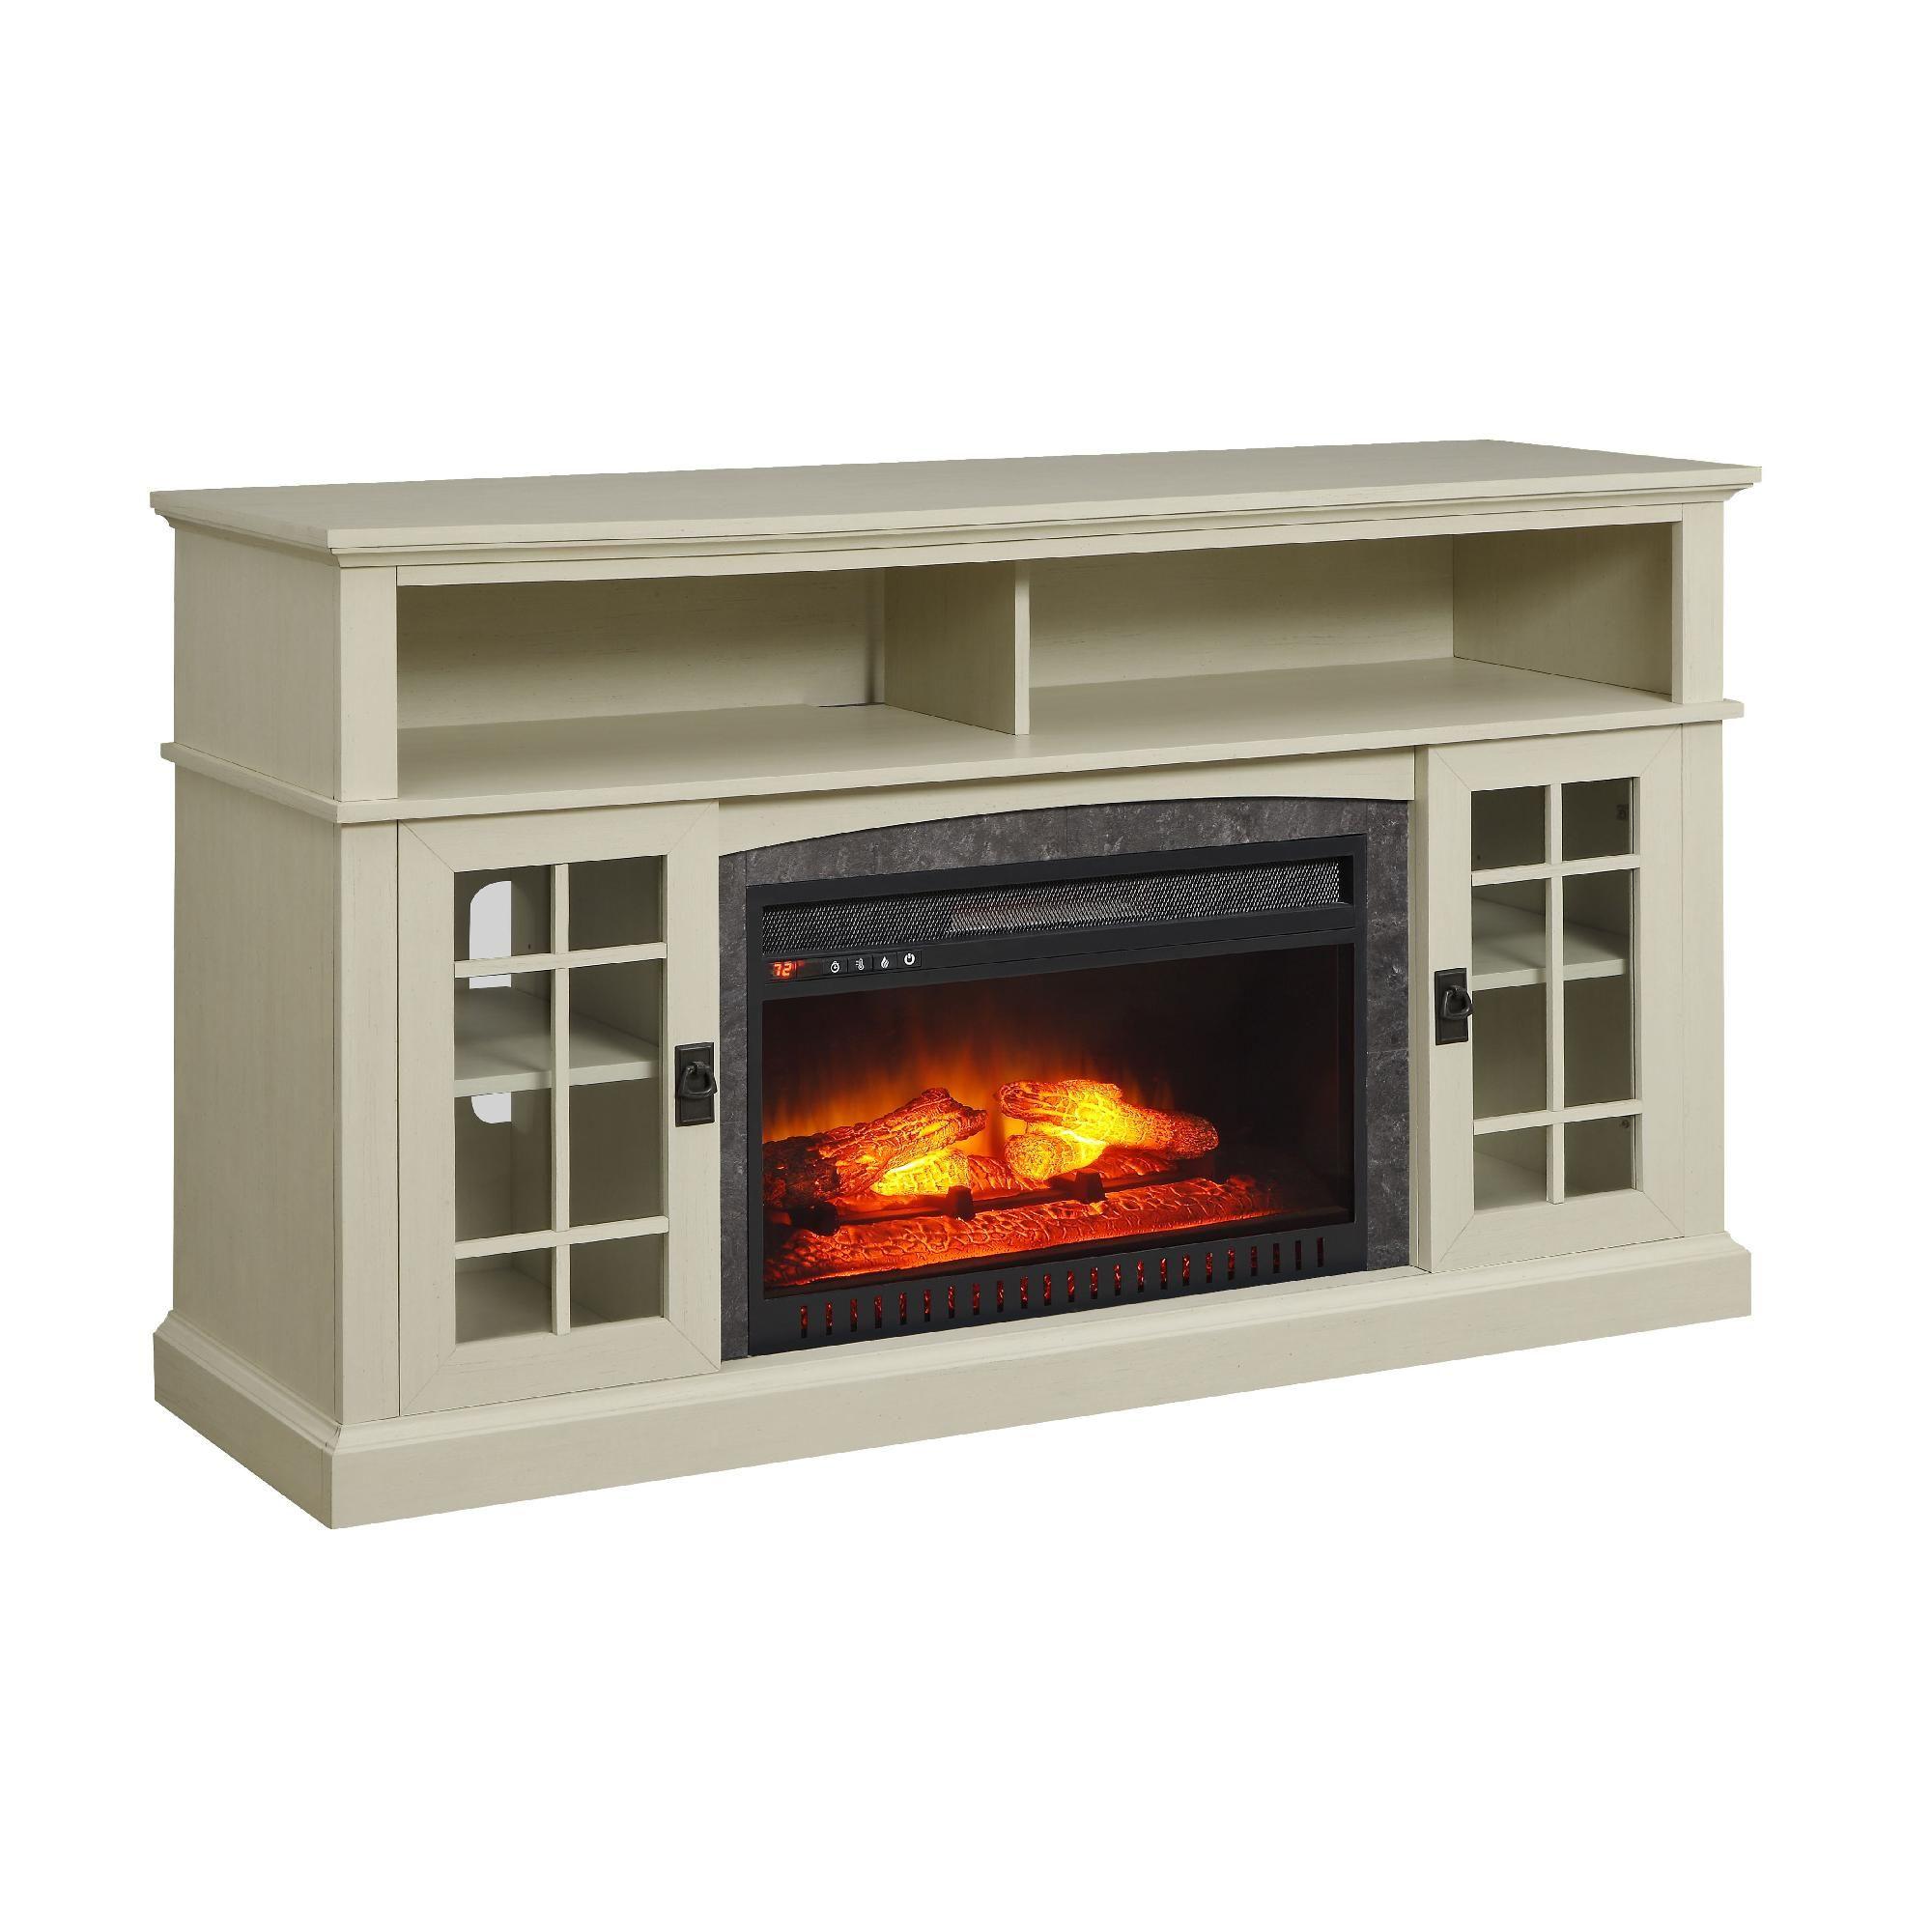 65 Inch Fireplace Tv Stand Black Fireplace Tv Stand Electric Fireplace Tv Stand White Tv Stands 65 inch tv stand with electric fireplace